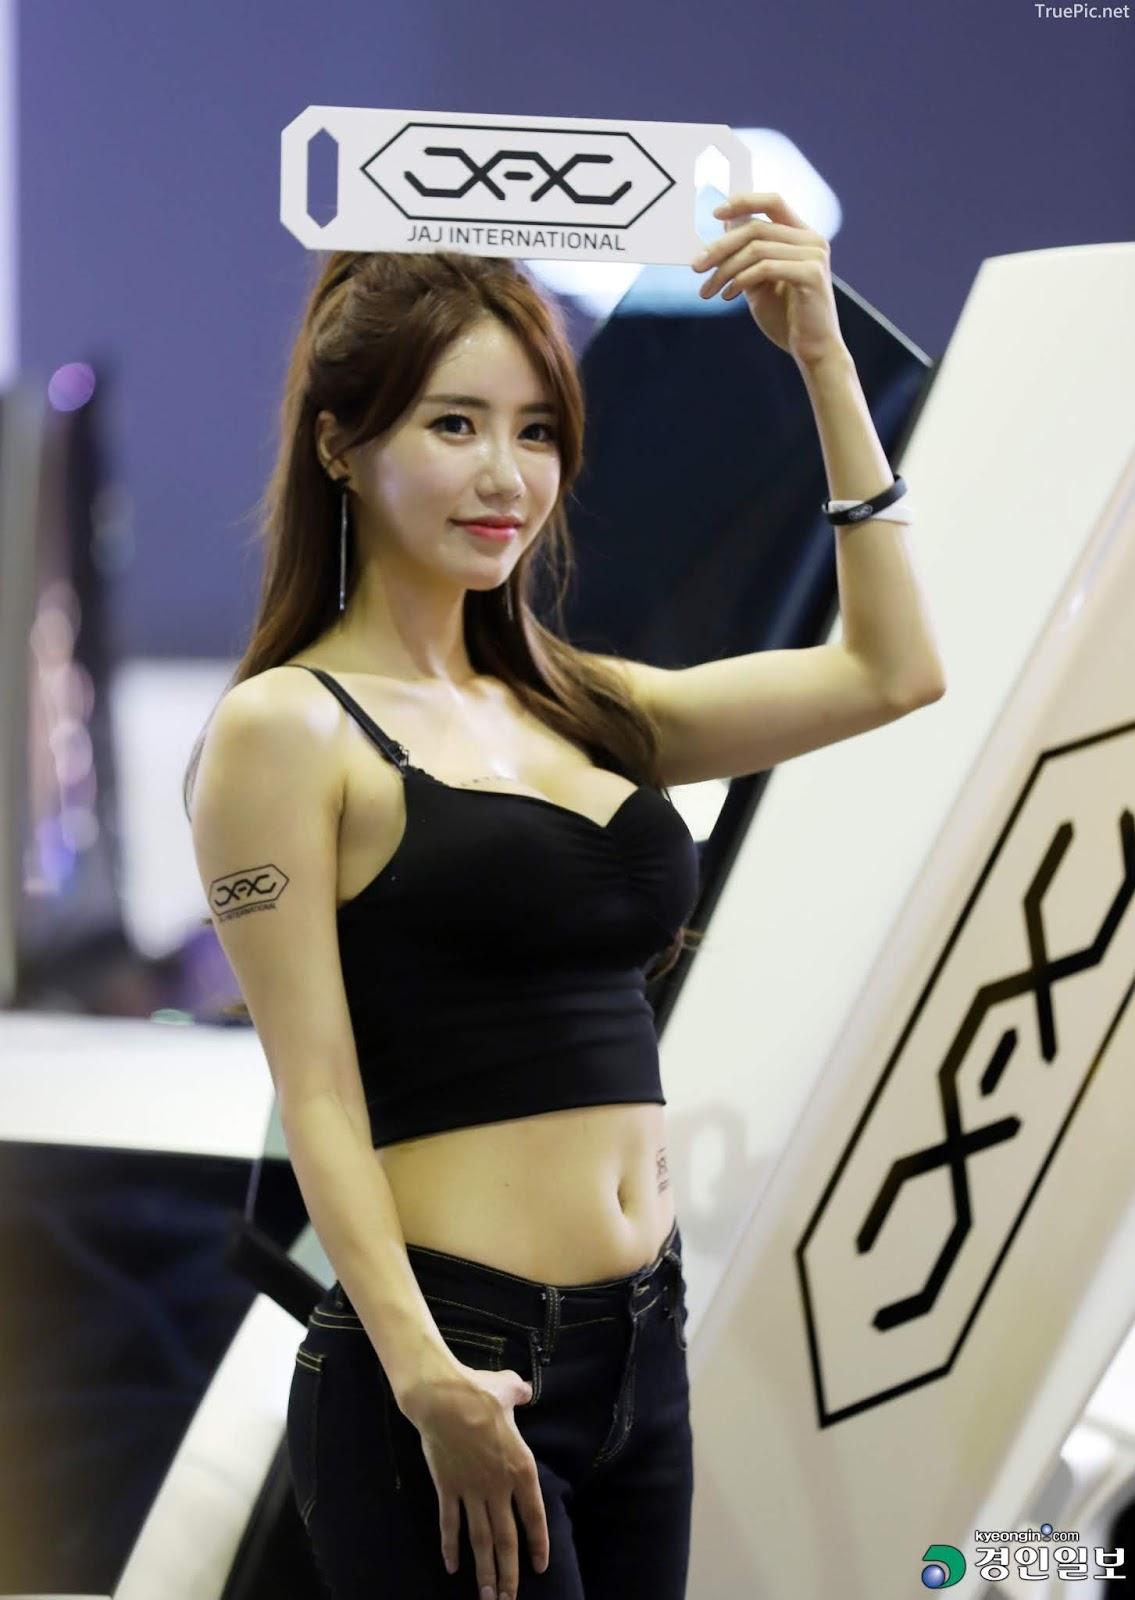 Korean Racing Model - Im Sola - Seoul Auto Salon 2019 - Picture 2